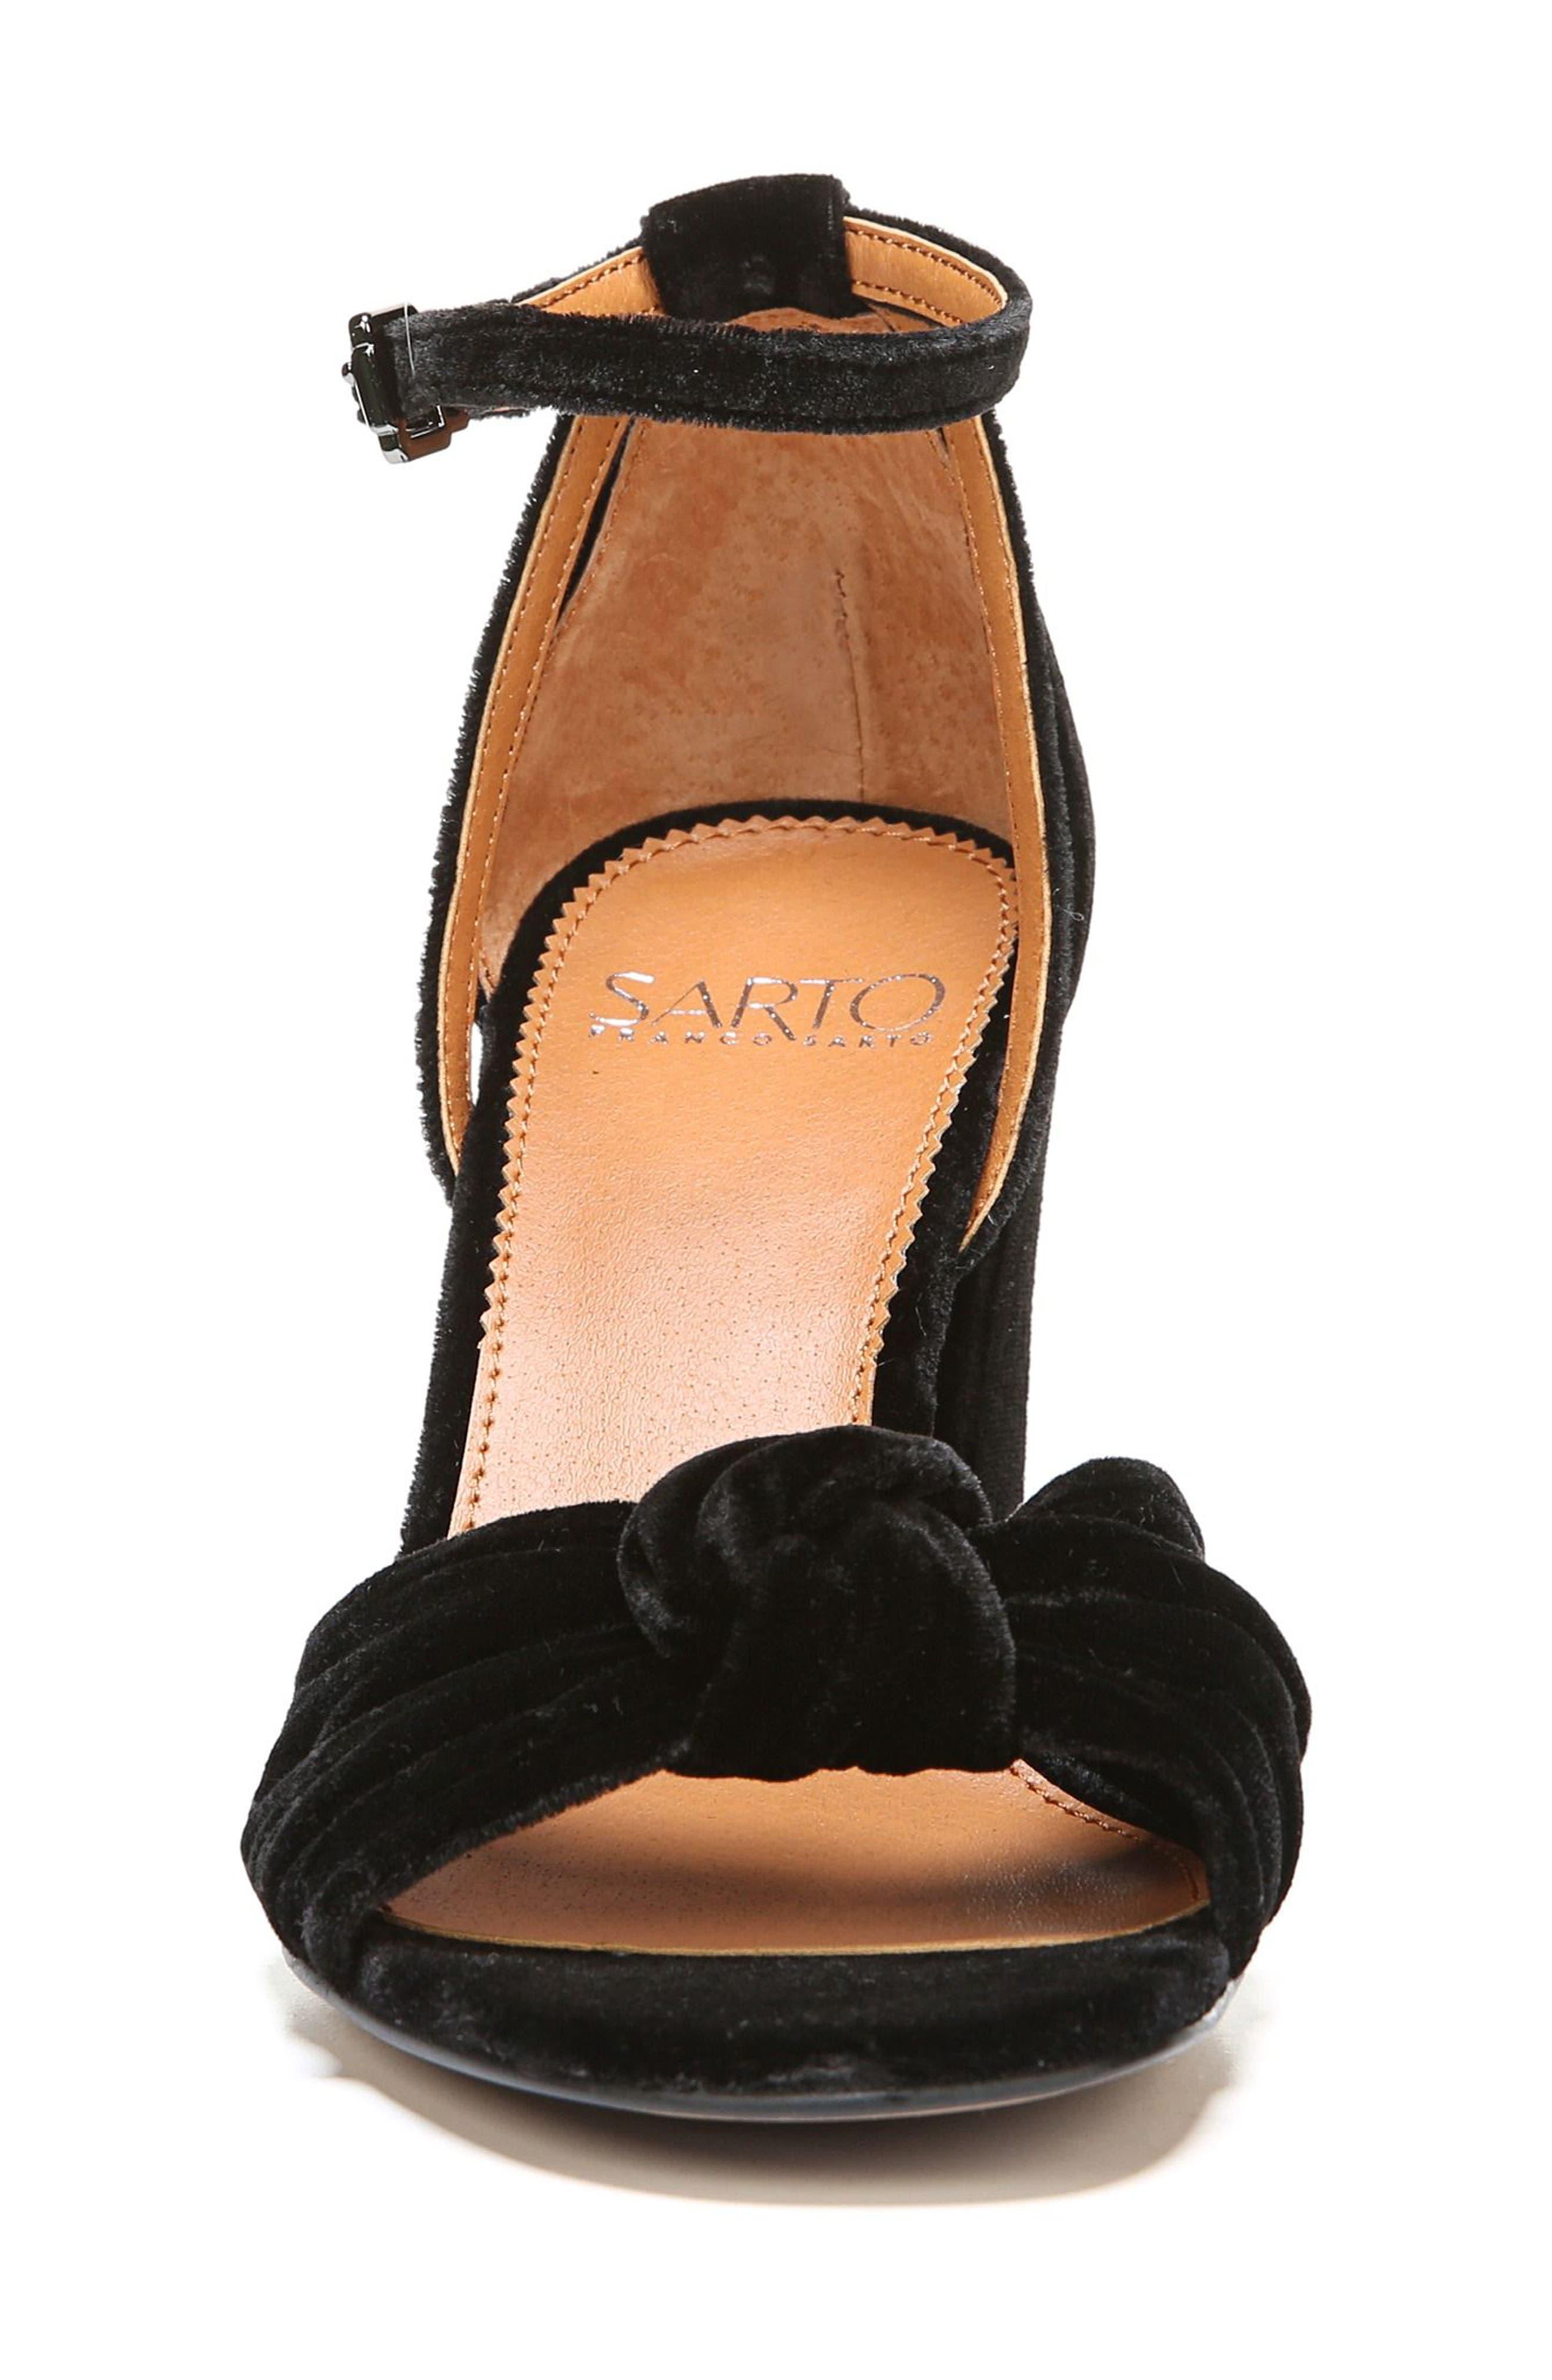 Edana Knotted Block Heel Sandal,                             Alternate thumbnail 4, color,                             001